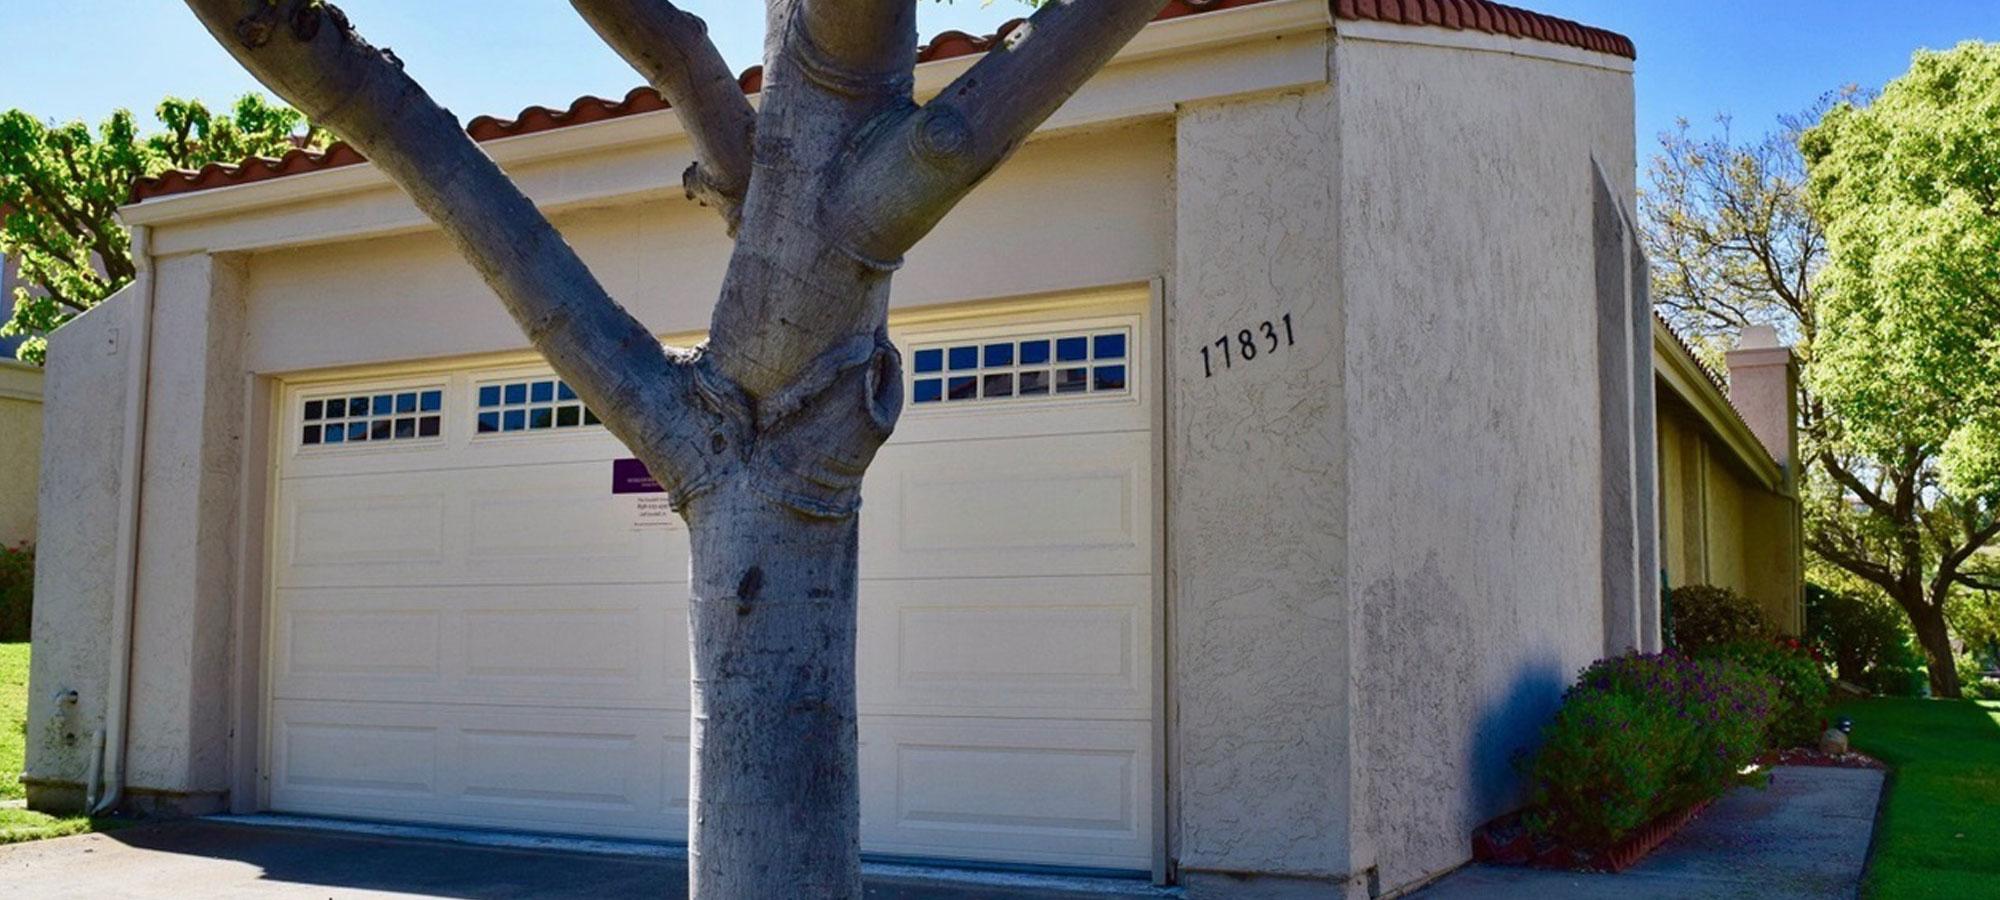 17831 Valle De Lobo Dr, Poway, CA 92064